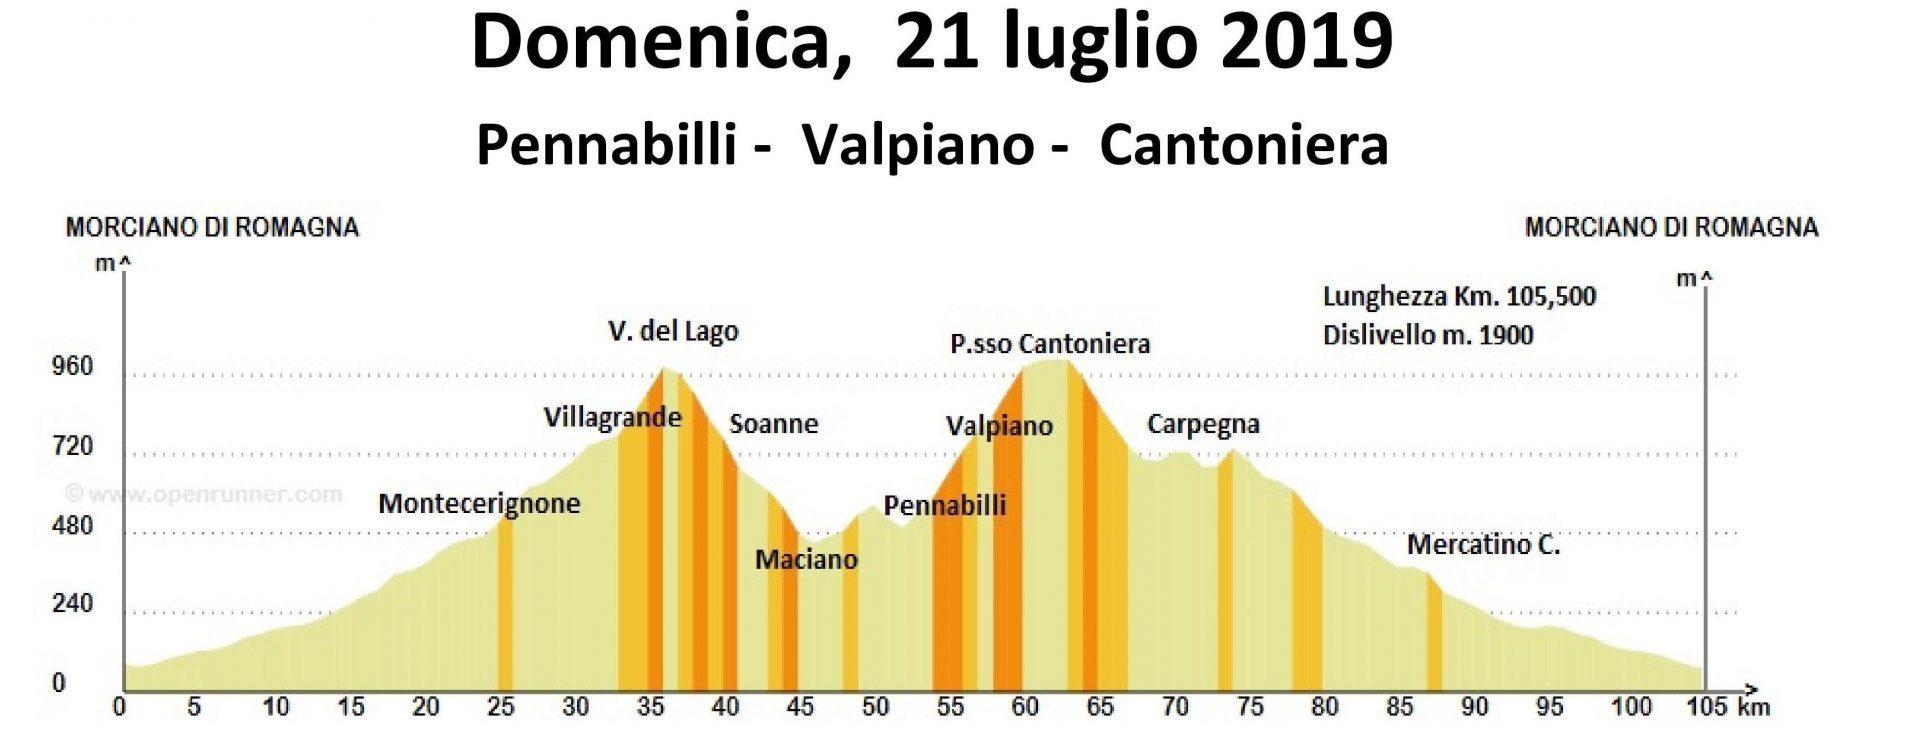 Domenica 21-lug-2019 Pennabilli Valpiano Cantoniera